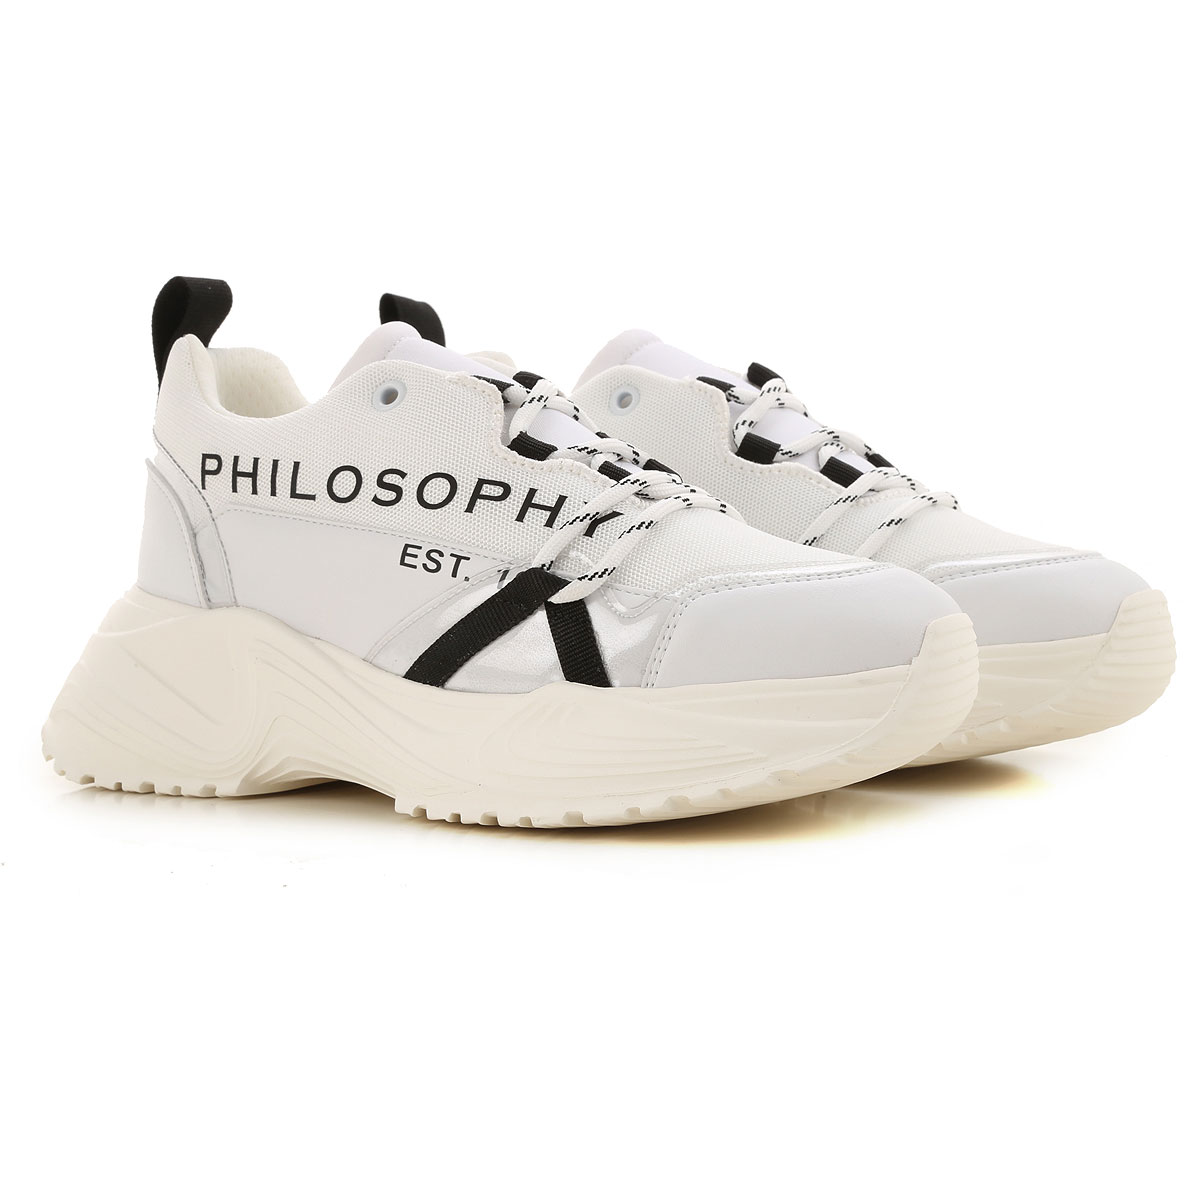 Philosophy di Lorenzo Serafini Sneaker Femme, Blanc, Tissu, 2019, 36 38 40